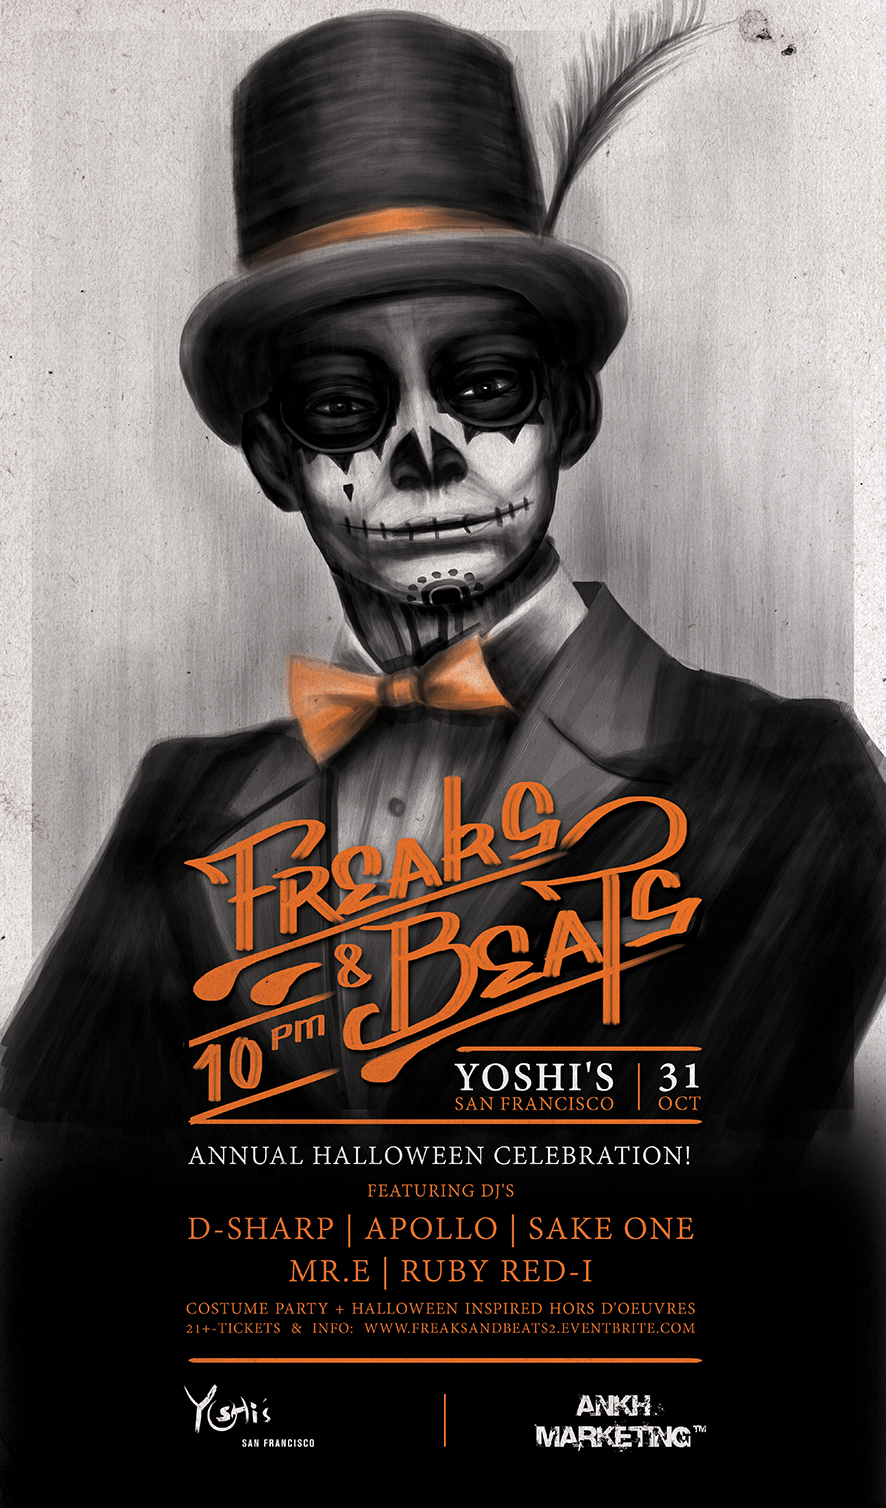 Freaks & Beats Halloween 2013